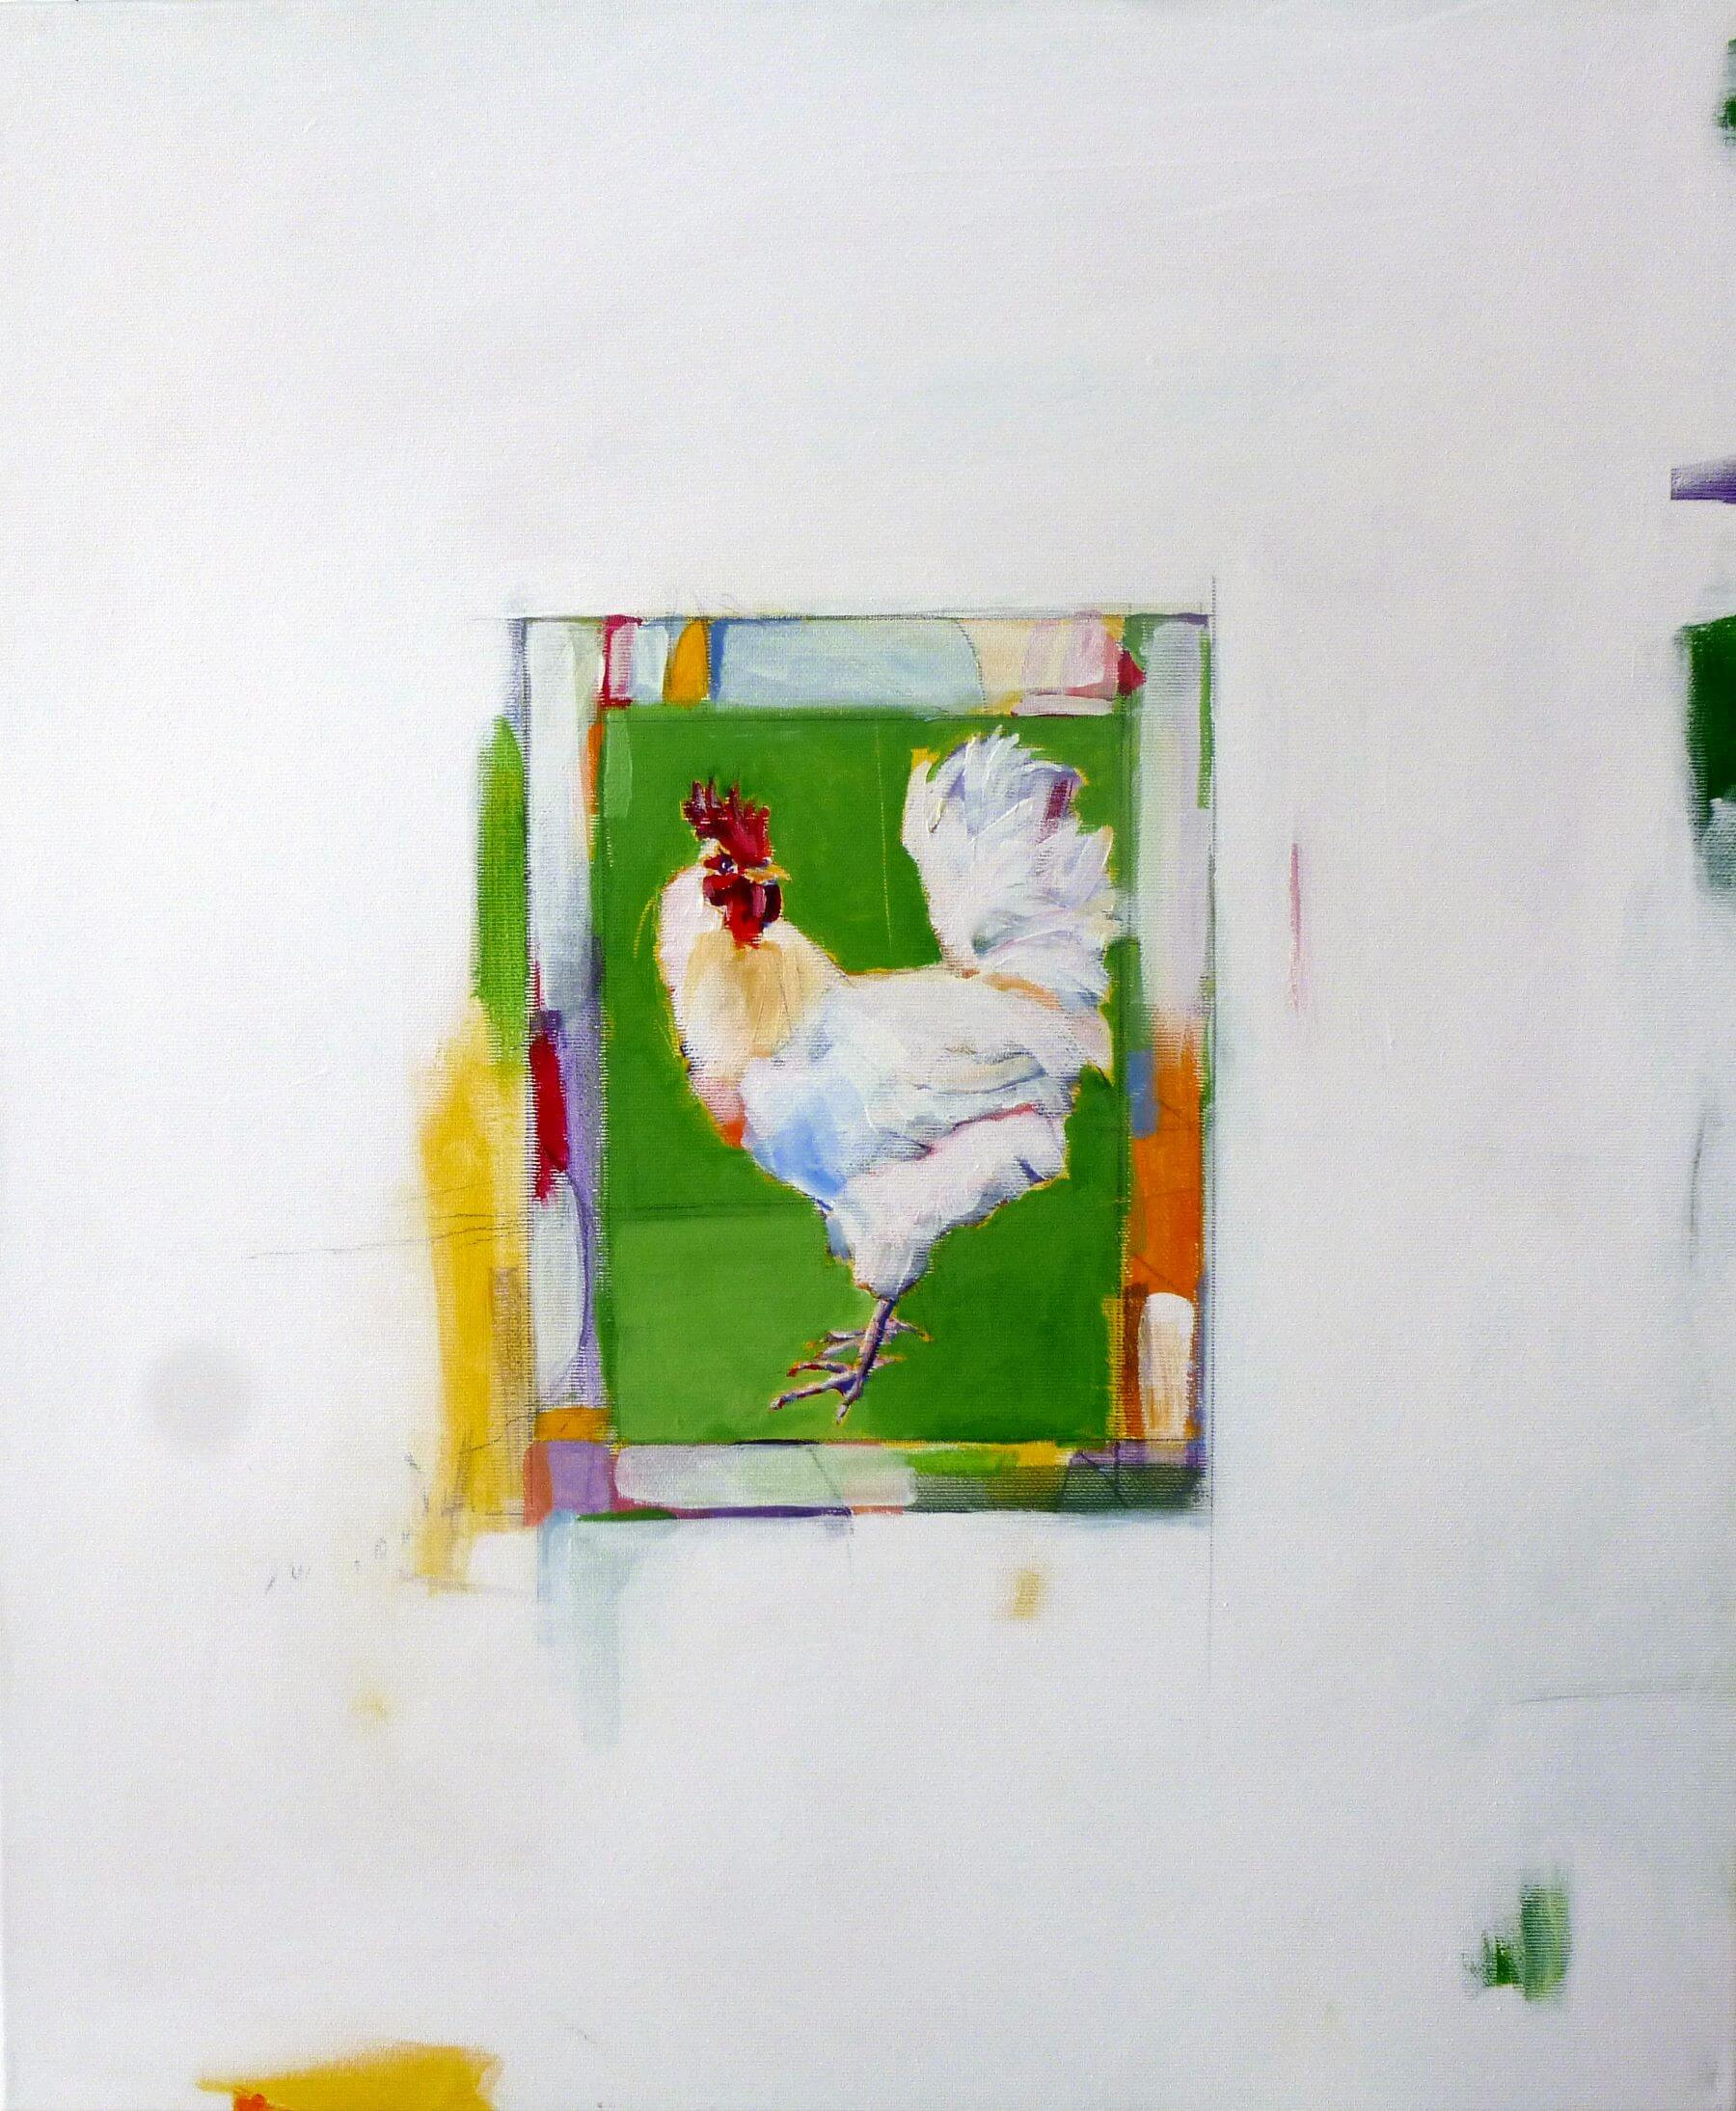 Green Cockerel - painting, acrylic on canvas by artist Neva Bergemann